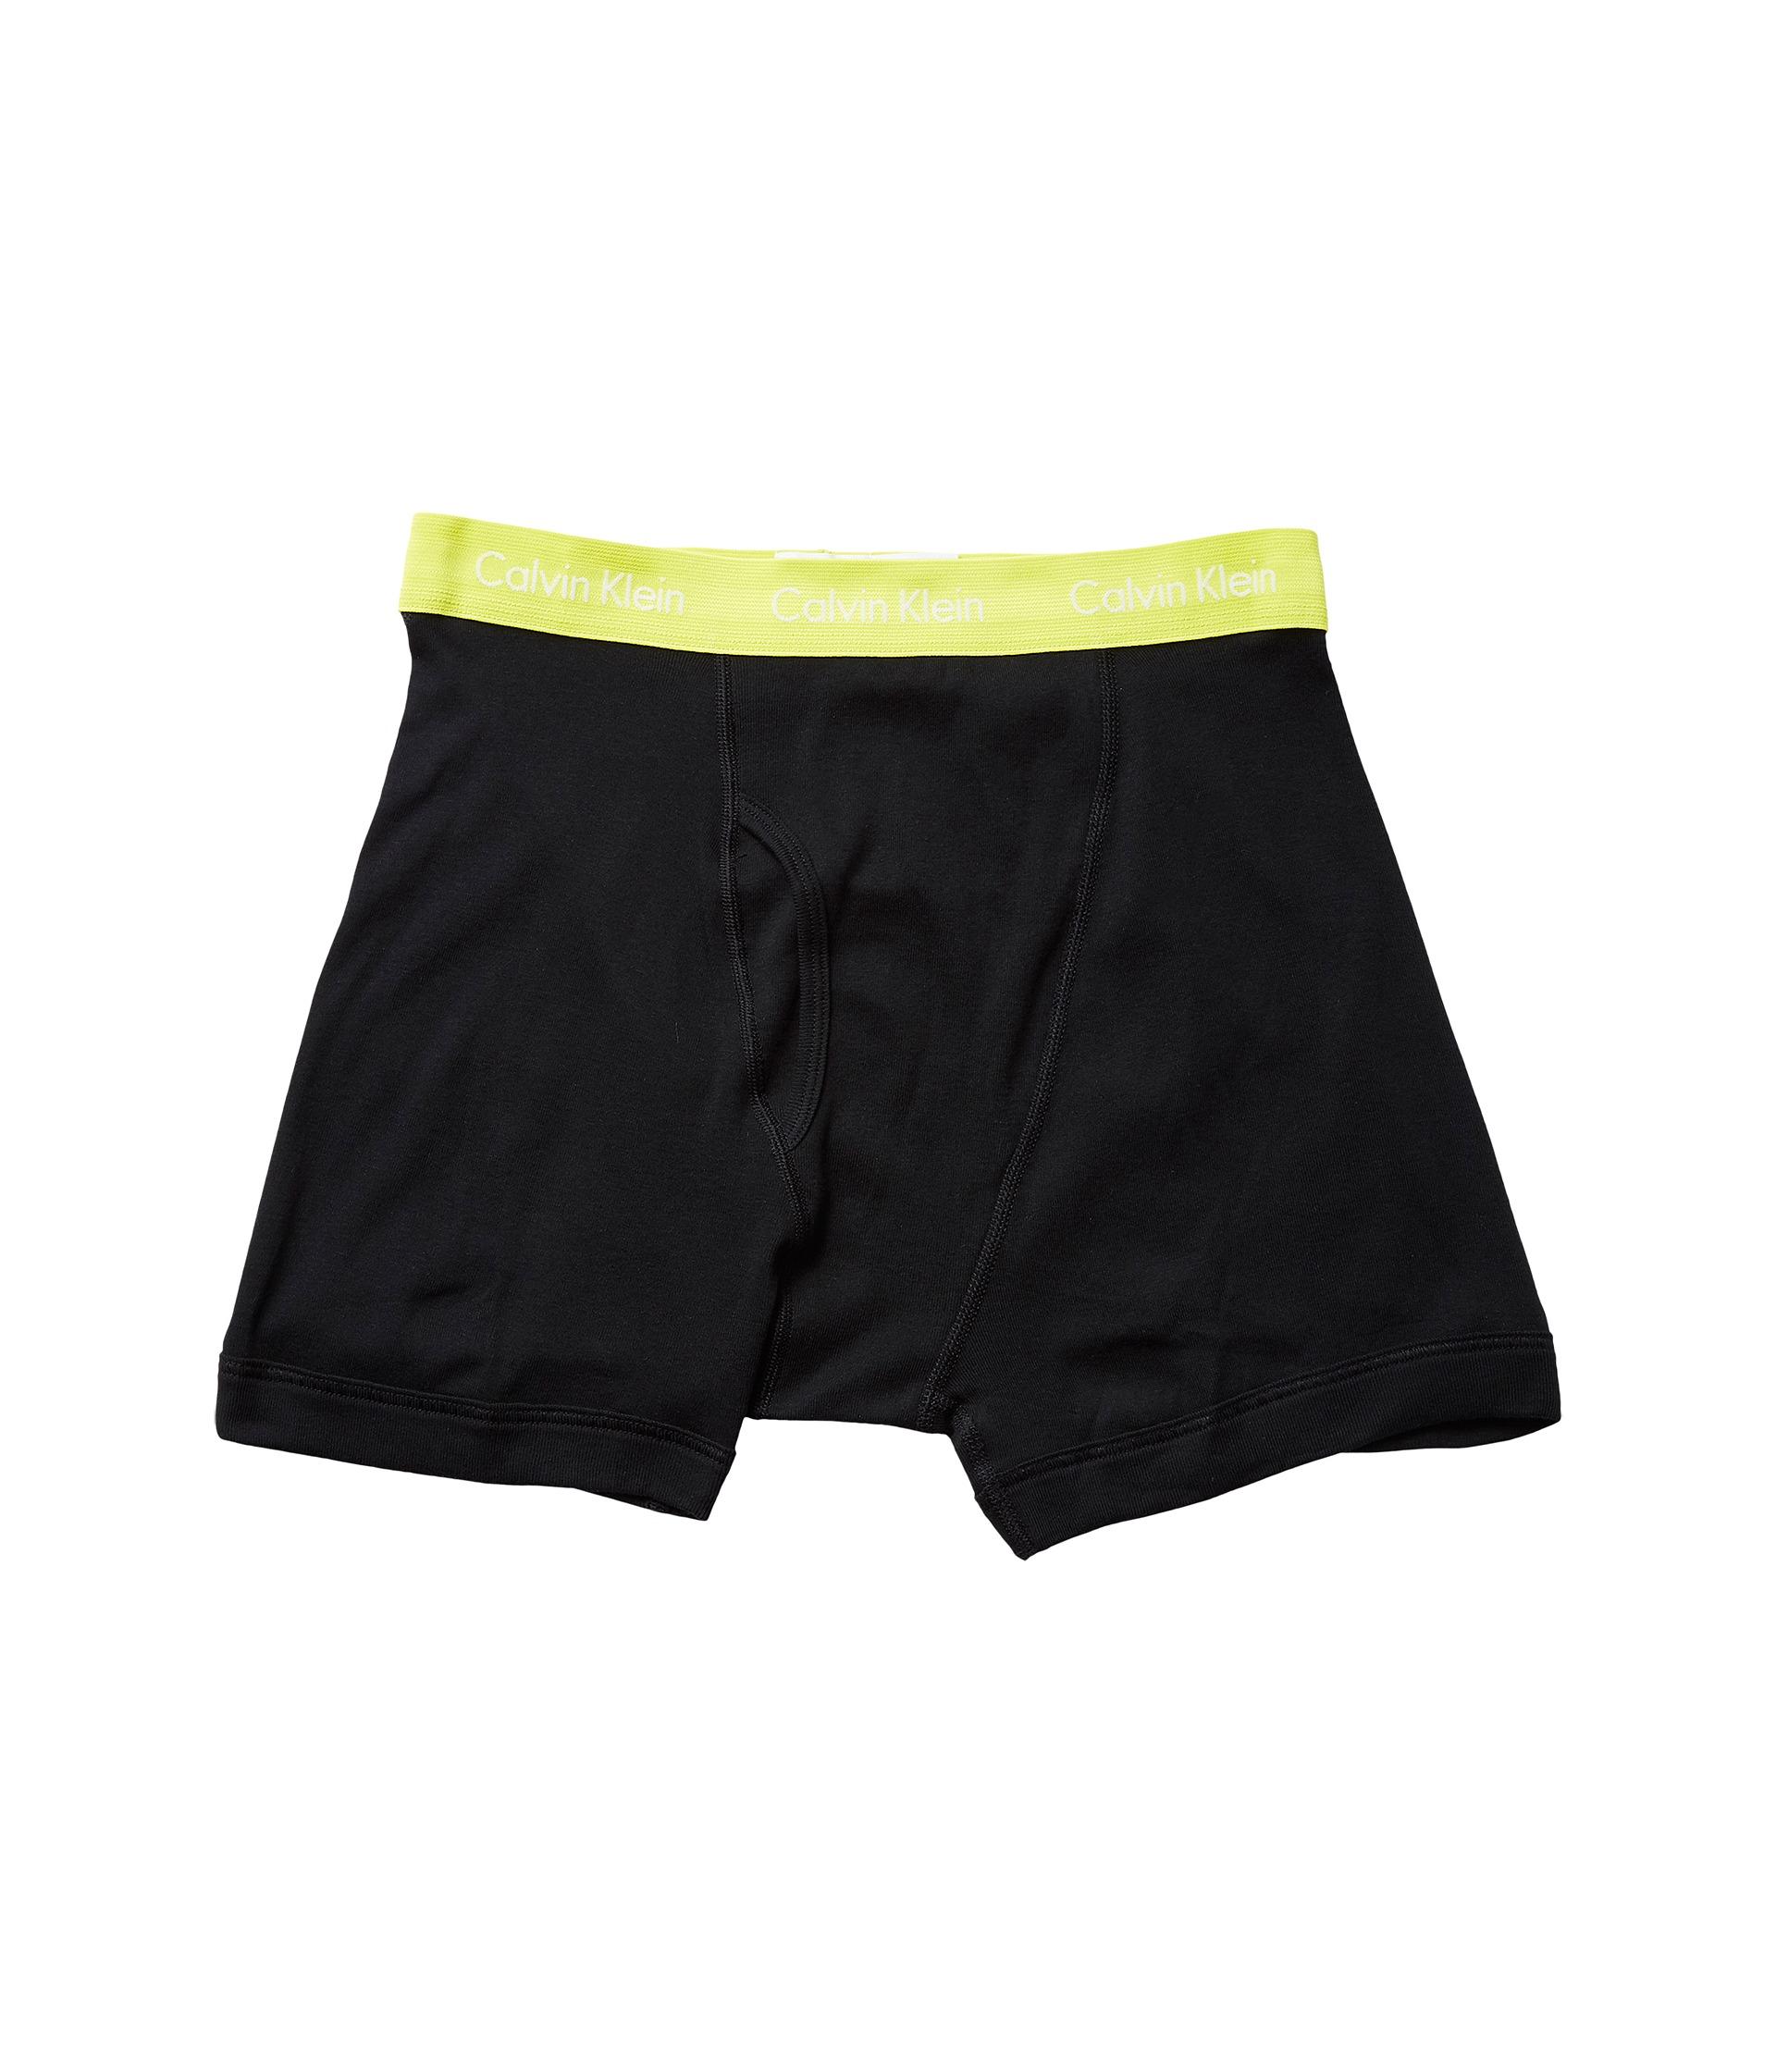 calvin klein underwear cotton classics 4 pack boxer briefs. Black Bedroom Furniture Sets. Home Design Ideas